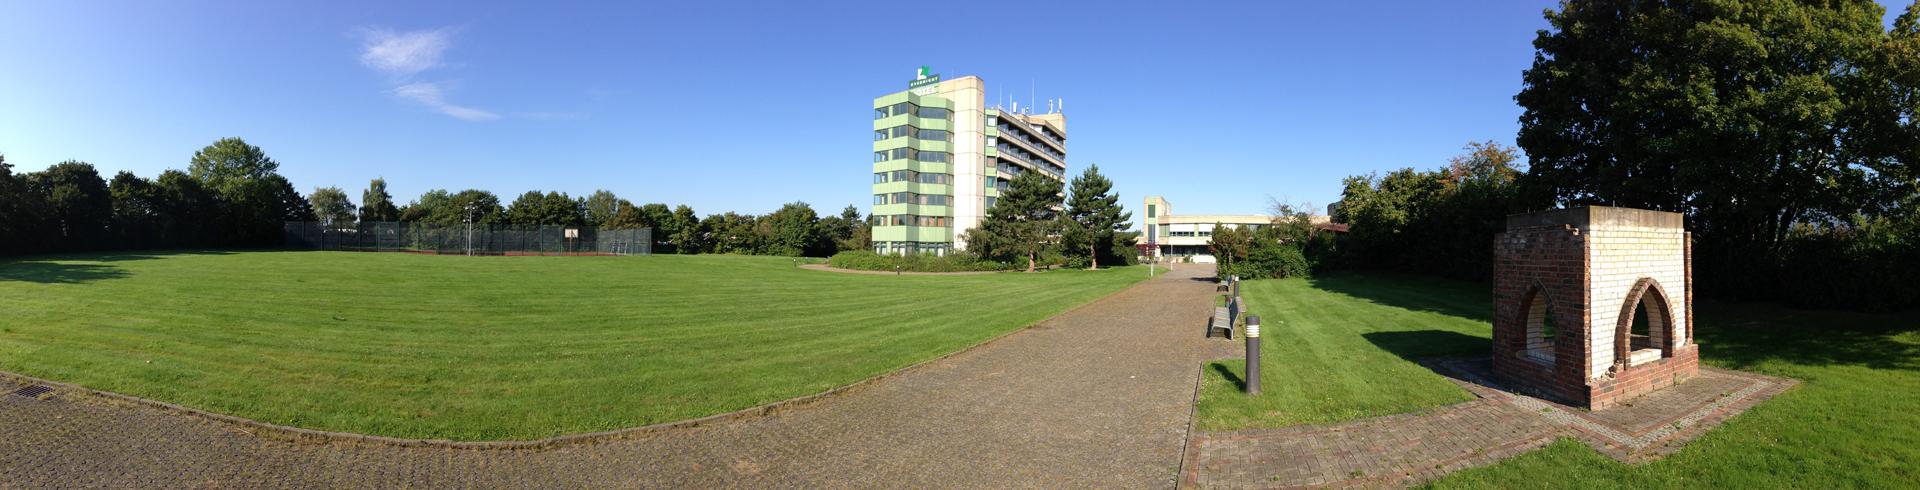 Panorama ABZ Kerpen